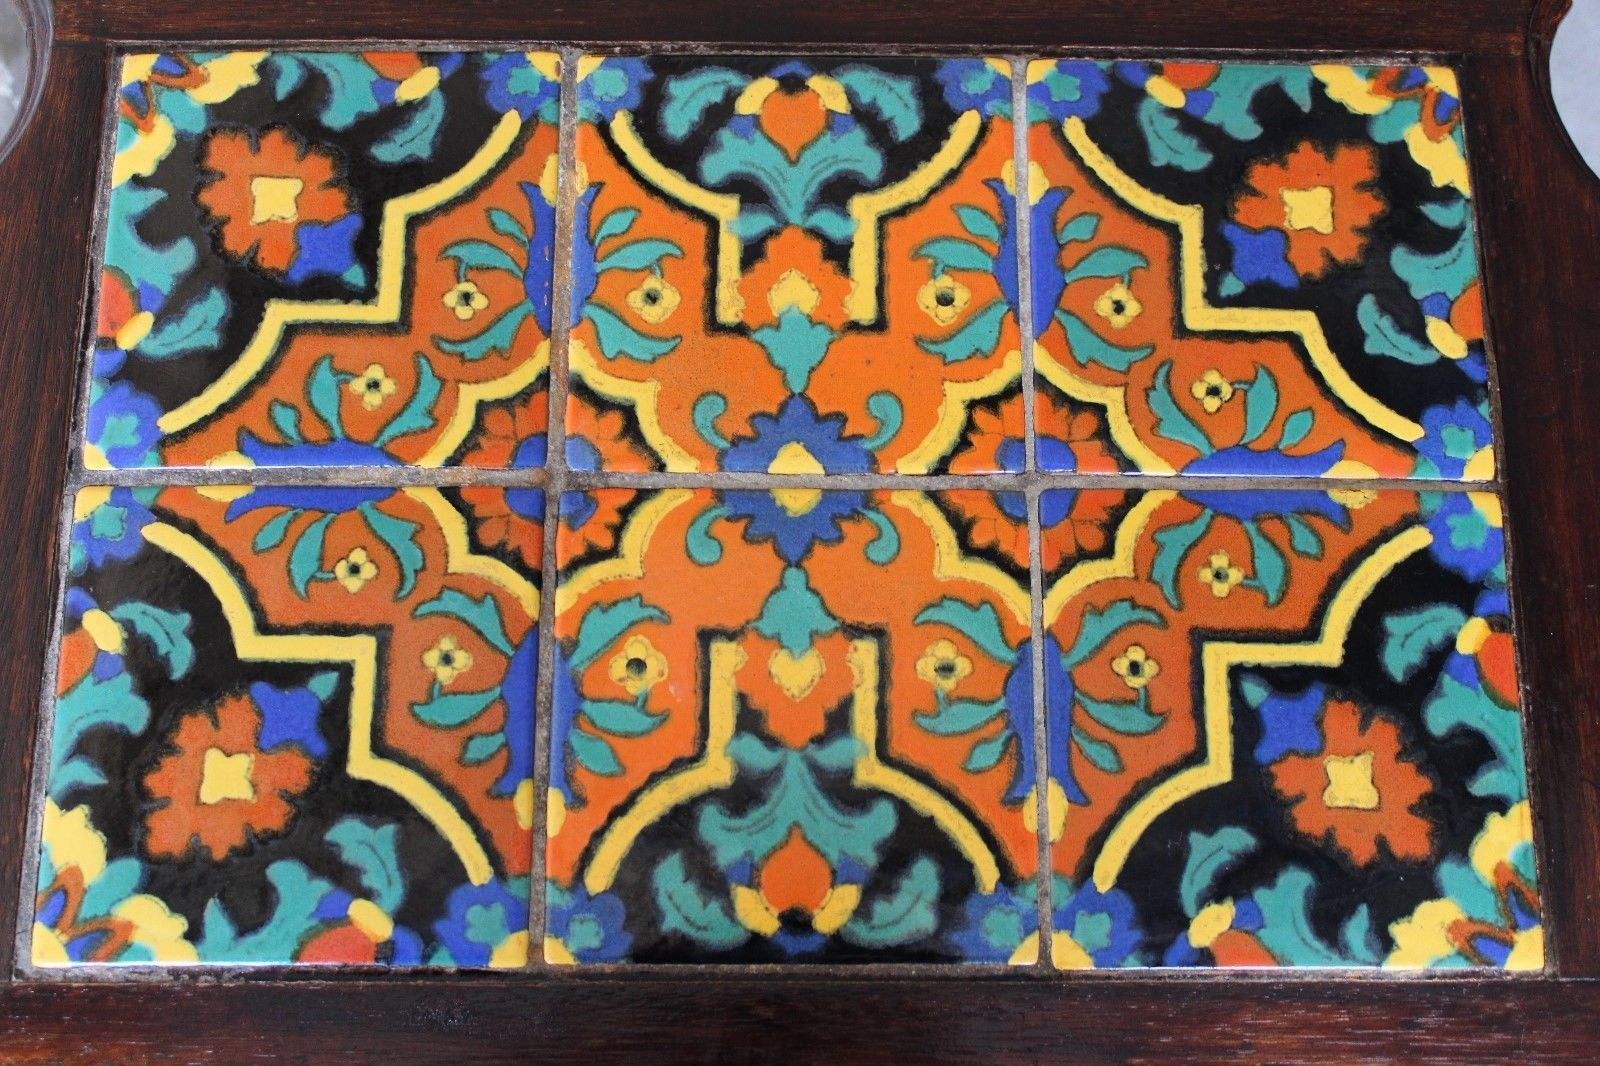 Antique 1930 S Monterey California Tile Top Table Mission Arts Crafts Taylor Ebay Vintage California Tile Art Mission Tile